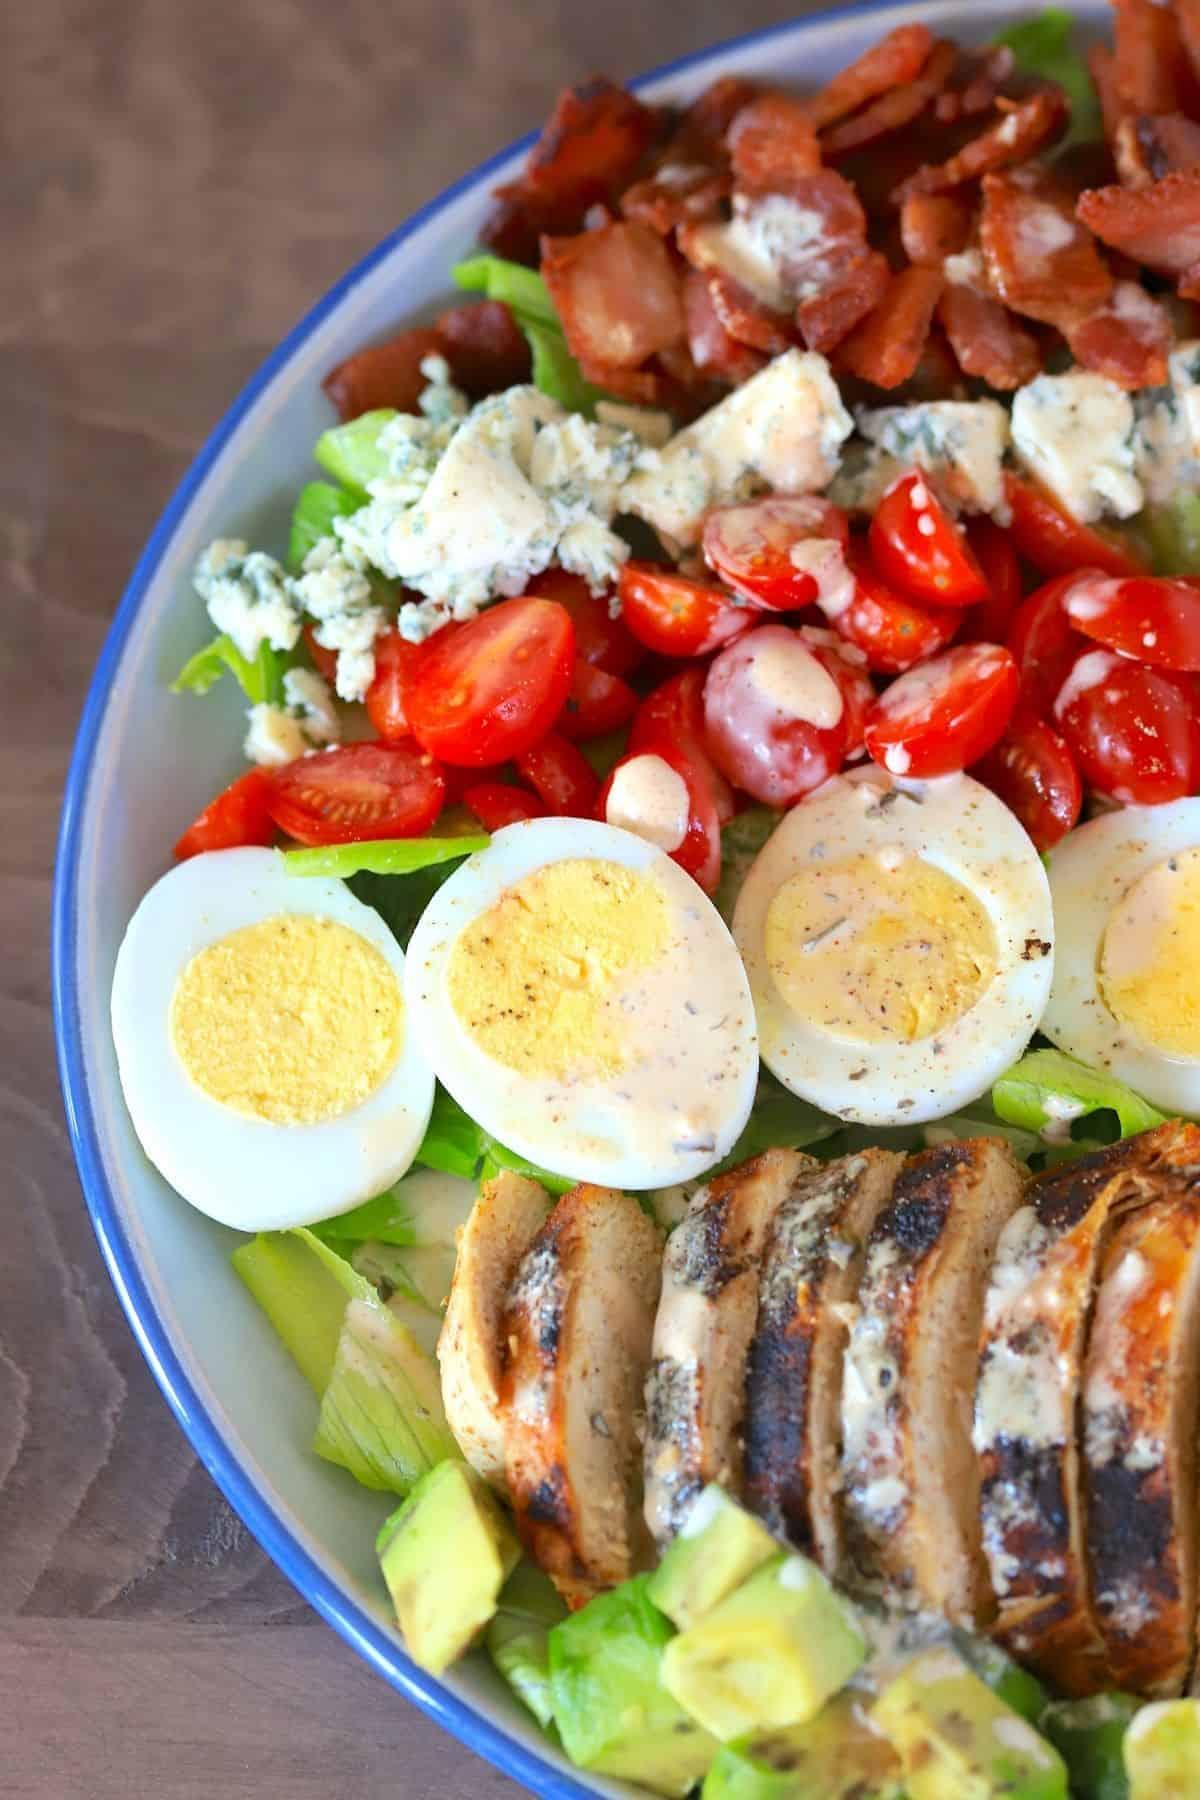 cobb salad on a blue rimmed plate